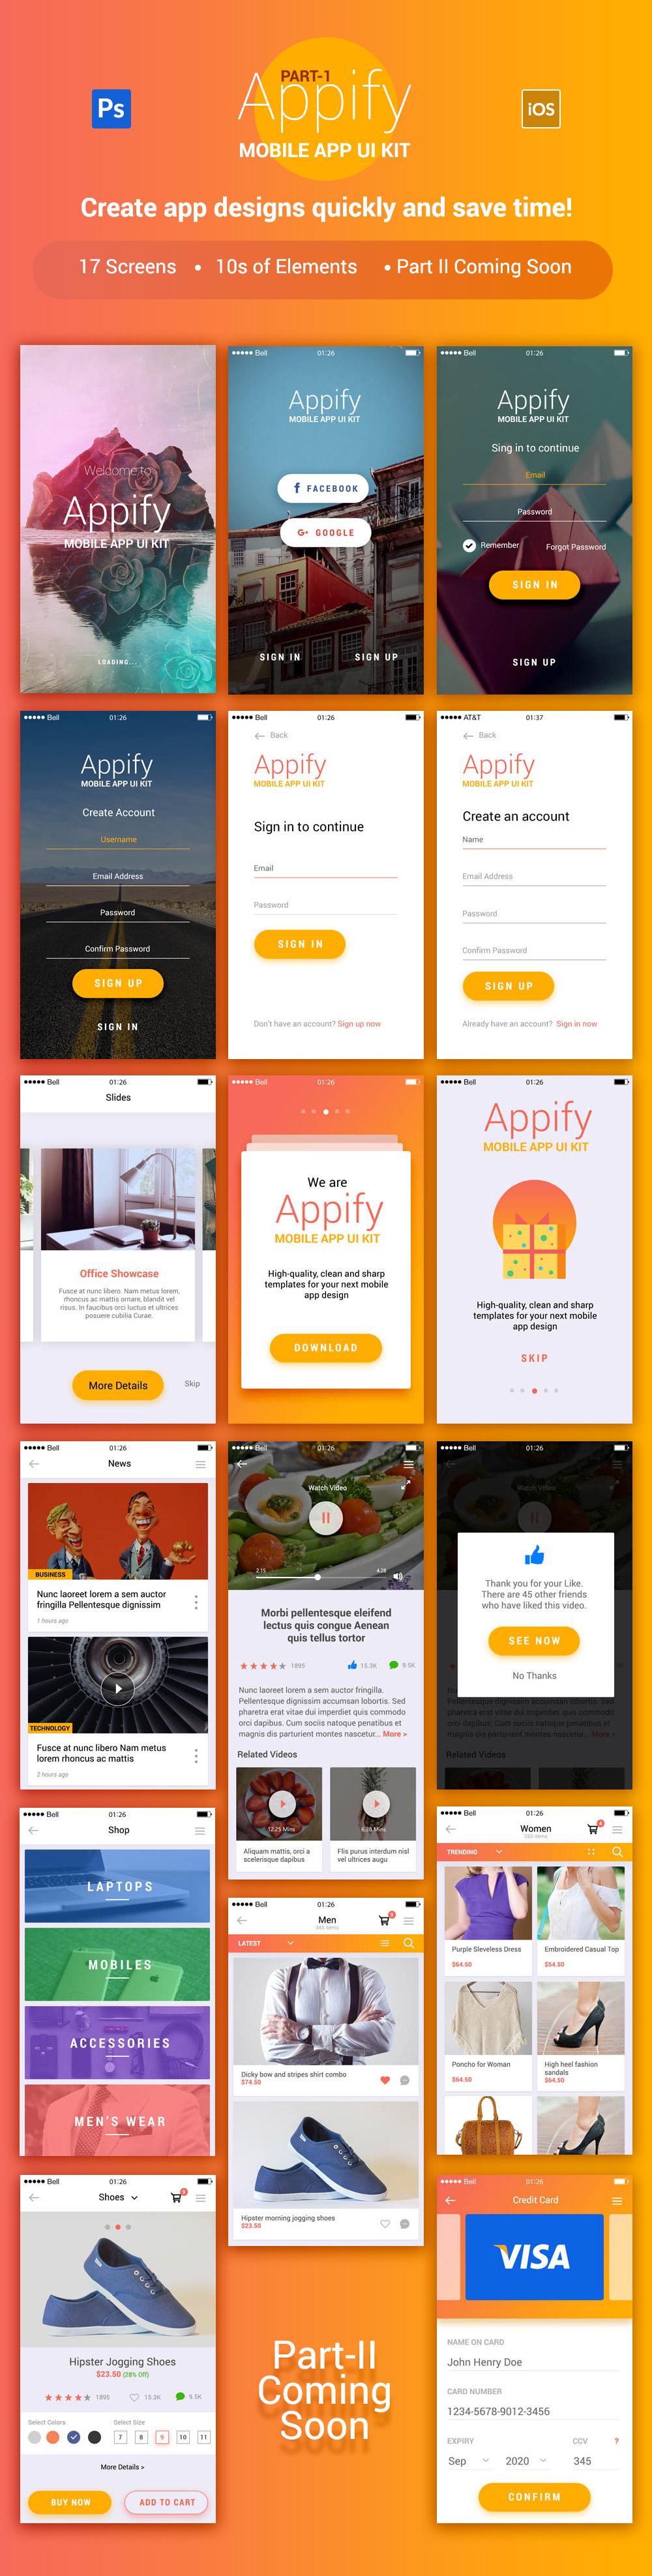 Appify Mobile App UI Kit